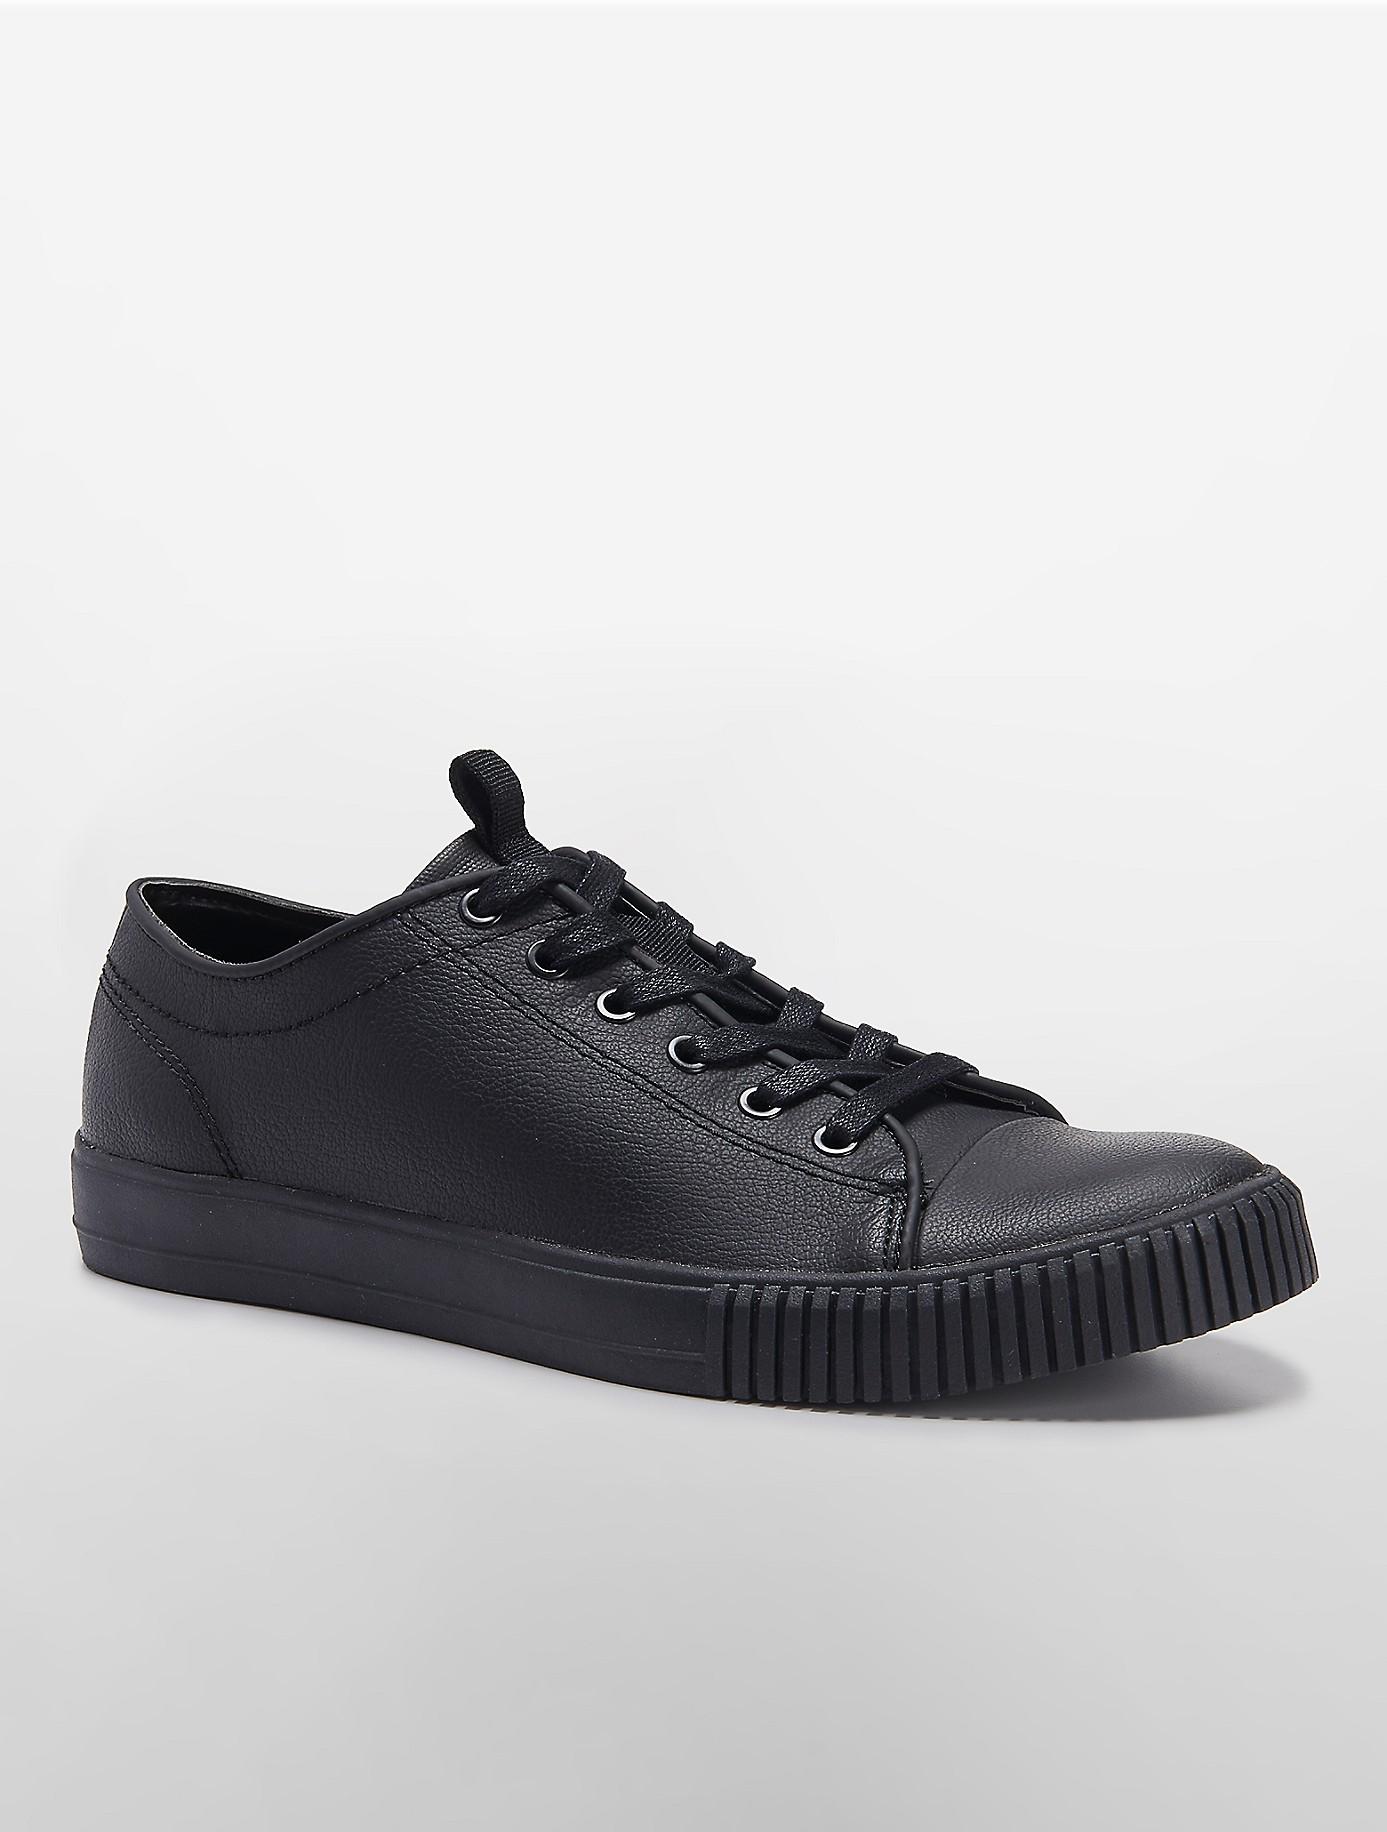 calvin klein jeans jerome low top sneaker in black lyst. Black Bedroom Furniture Sets. Home Design Ideas